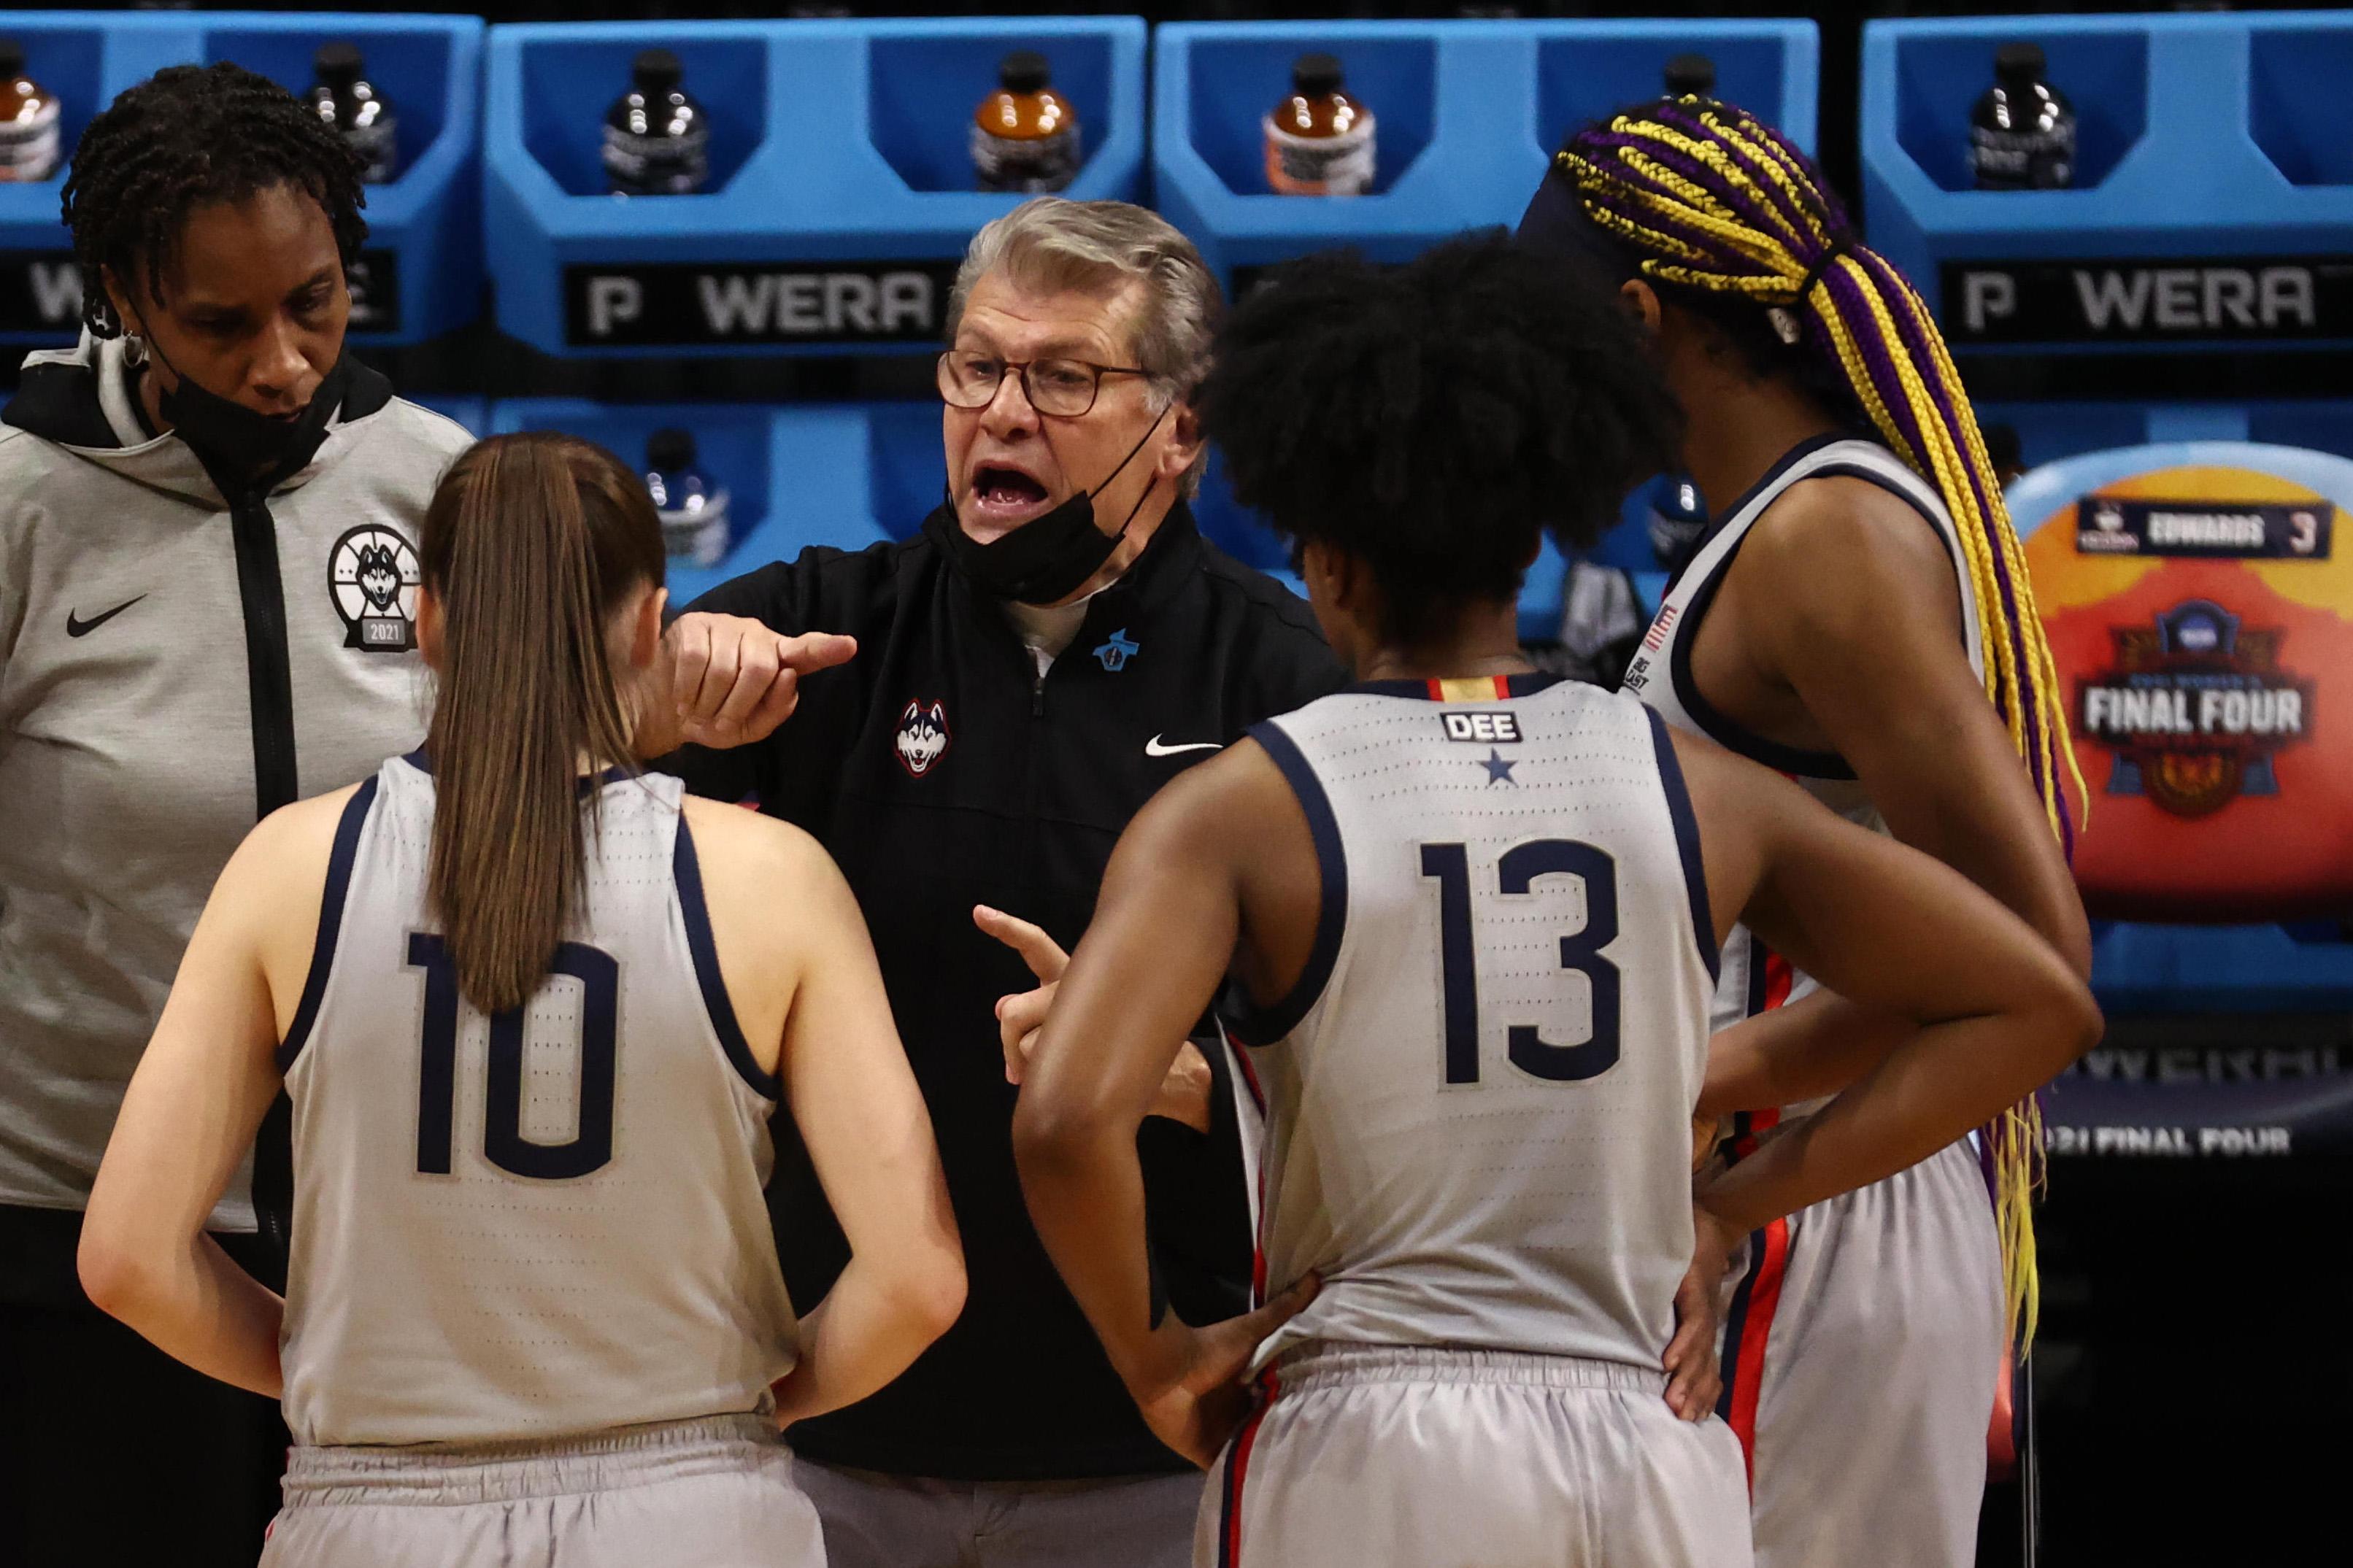 NCAA Womens Basketball: Final Four Semifinal-Arizona at Connecticut